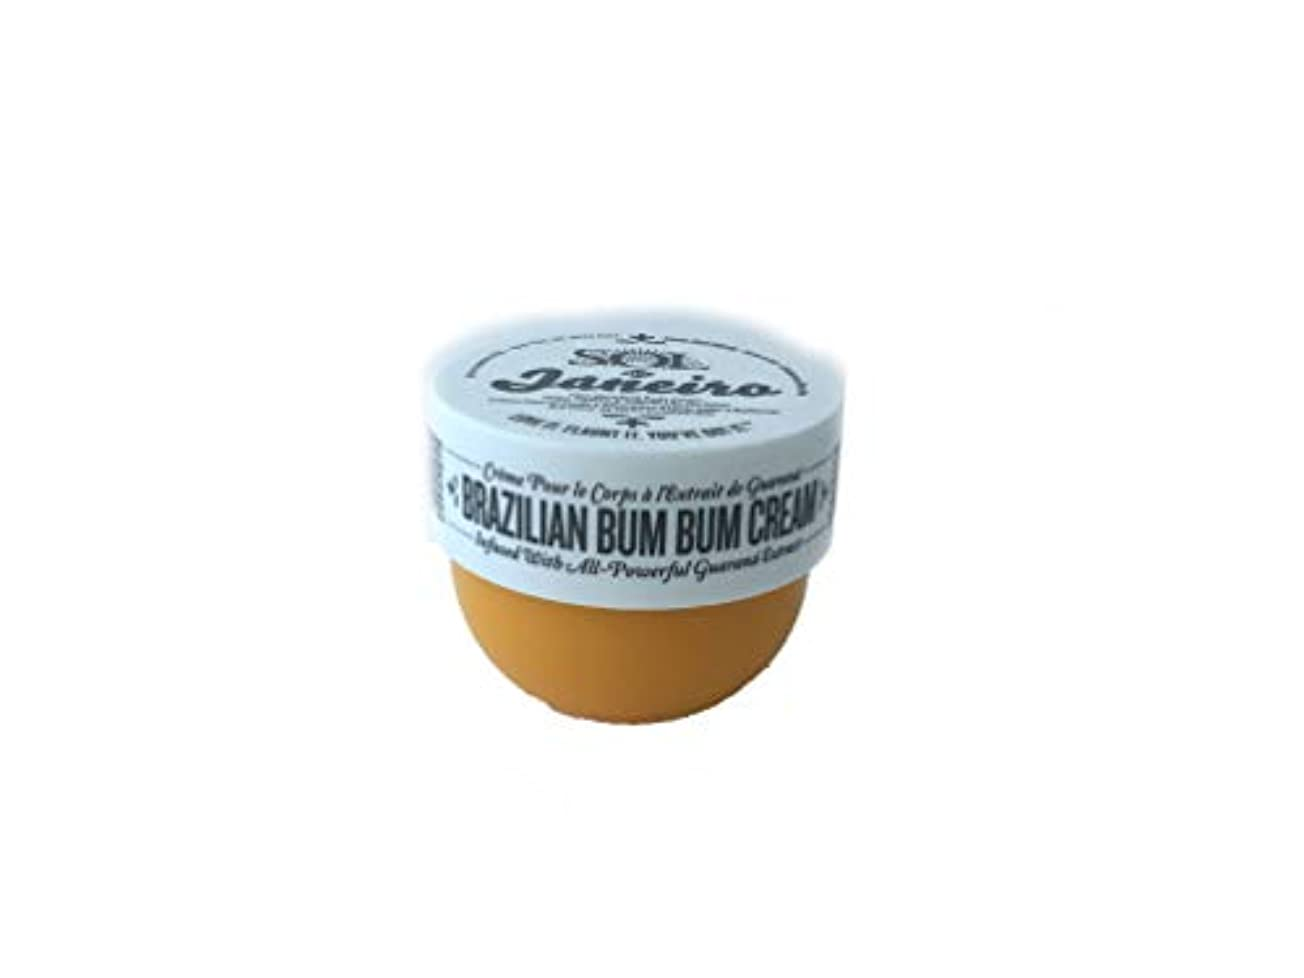 Brazilian BUM BUM Cream 25ml トライアルサイズ【並行輸入品】